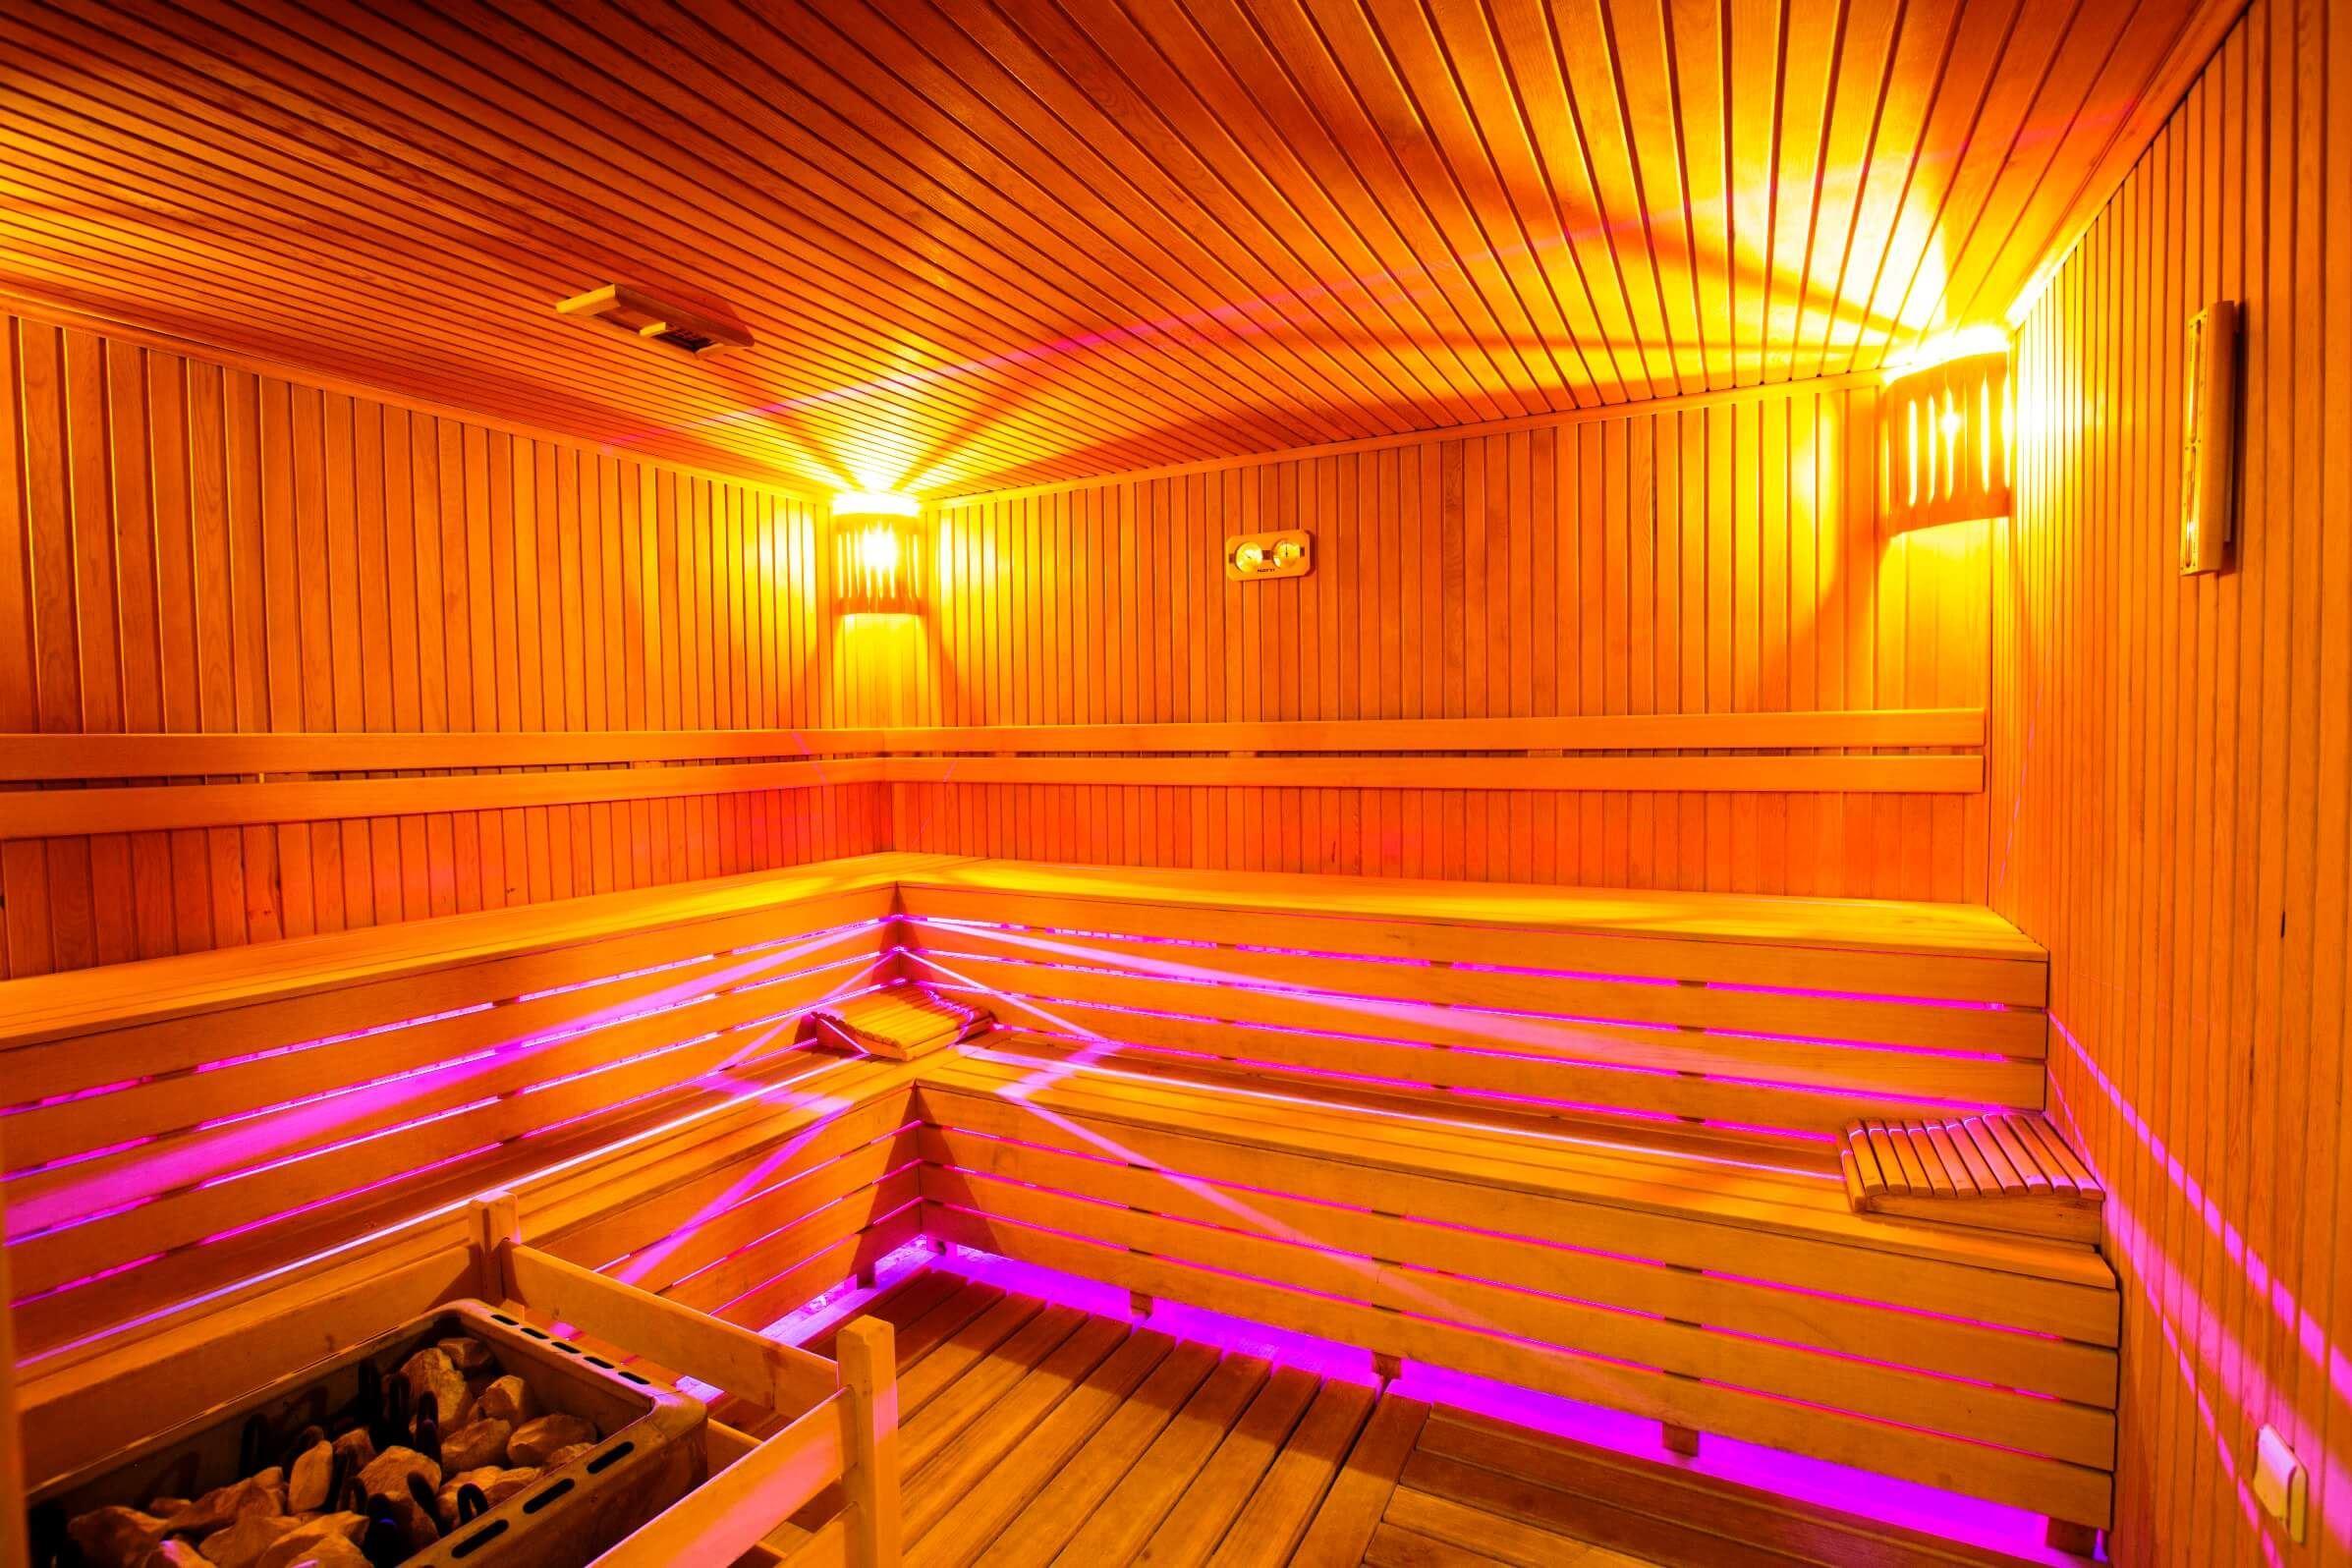 http://www.orextravel.sk/OREX/hotelphotos/ramada-resort-side-general-0010.jpg